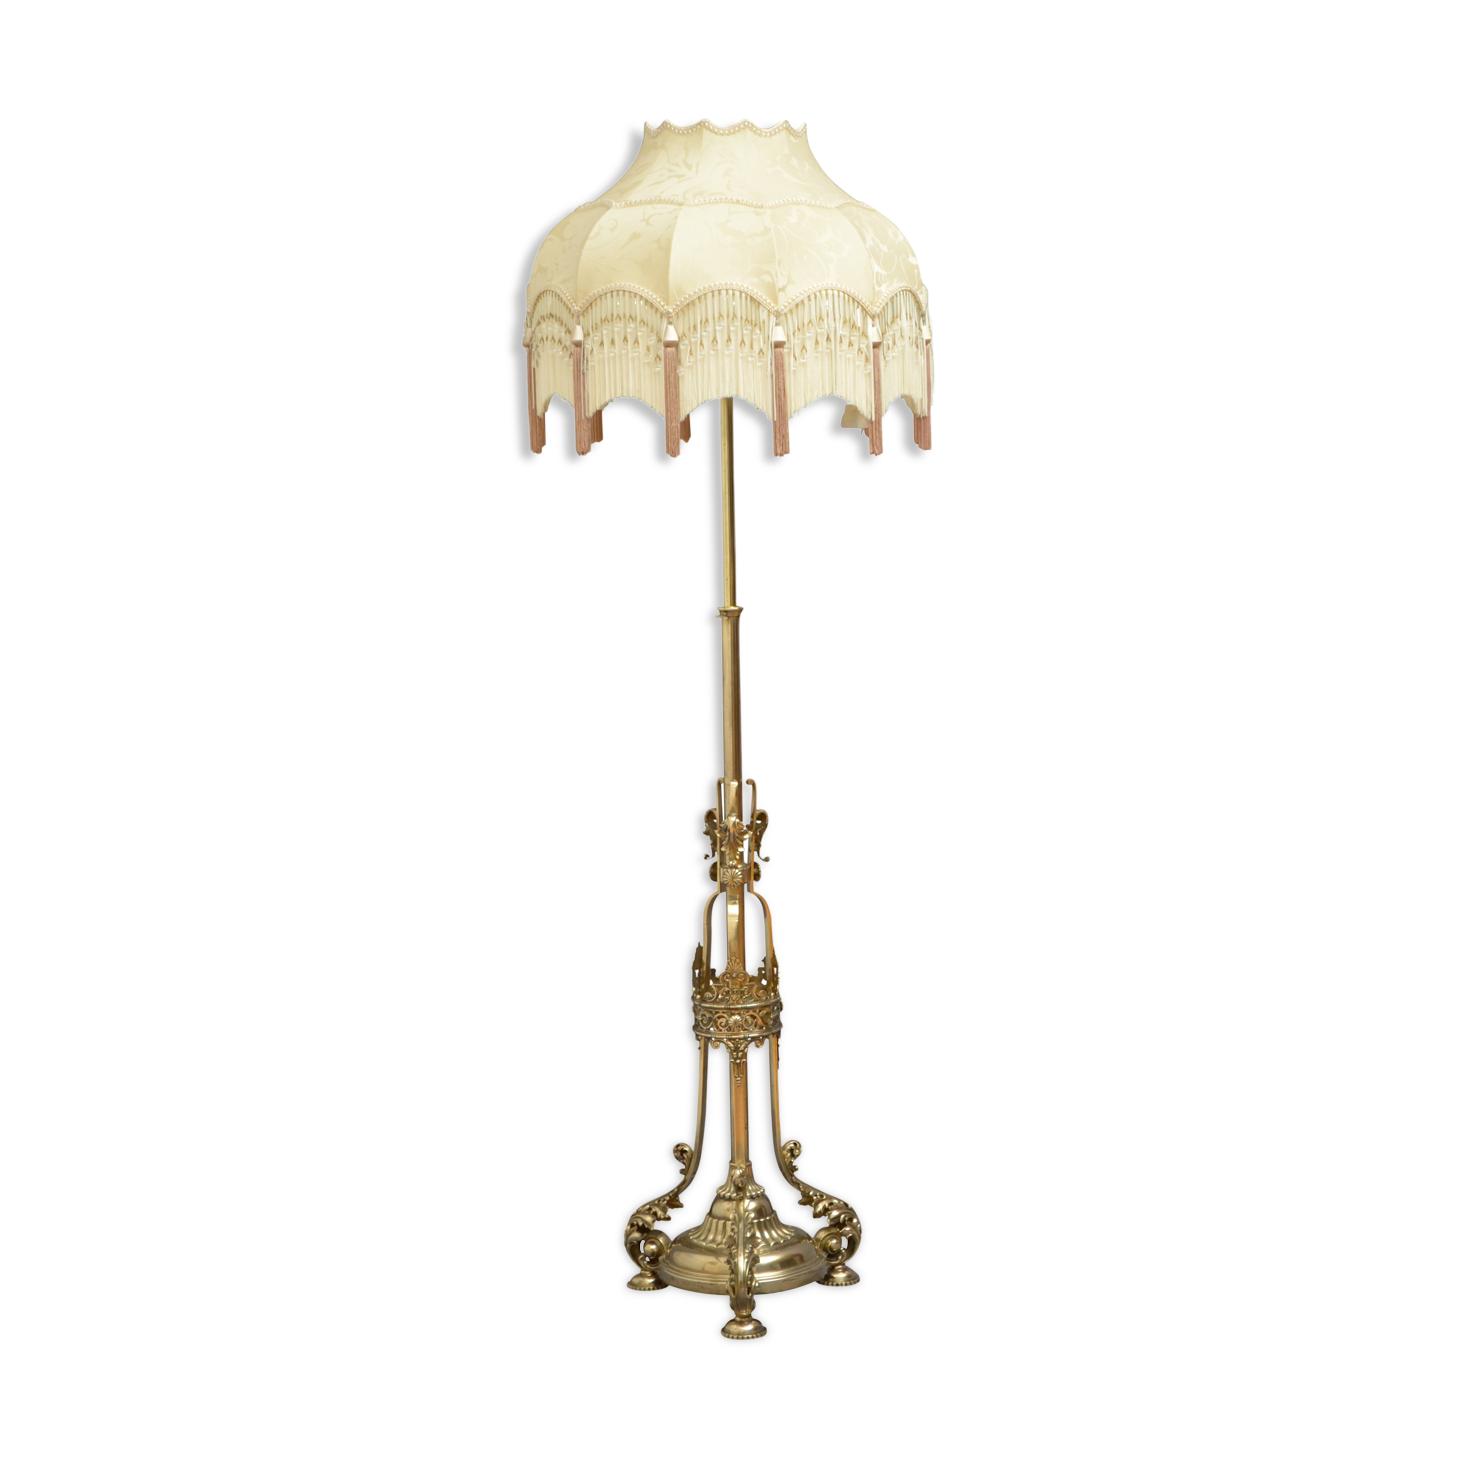 Victorian Brass Floor Standard Lamp par R. W. Winfield, Birmingham